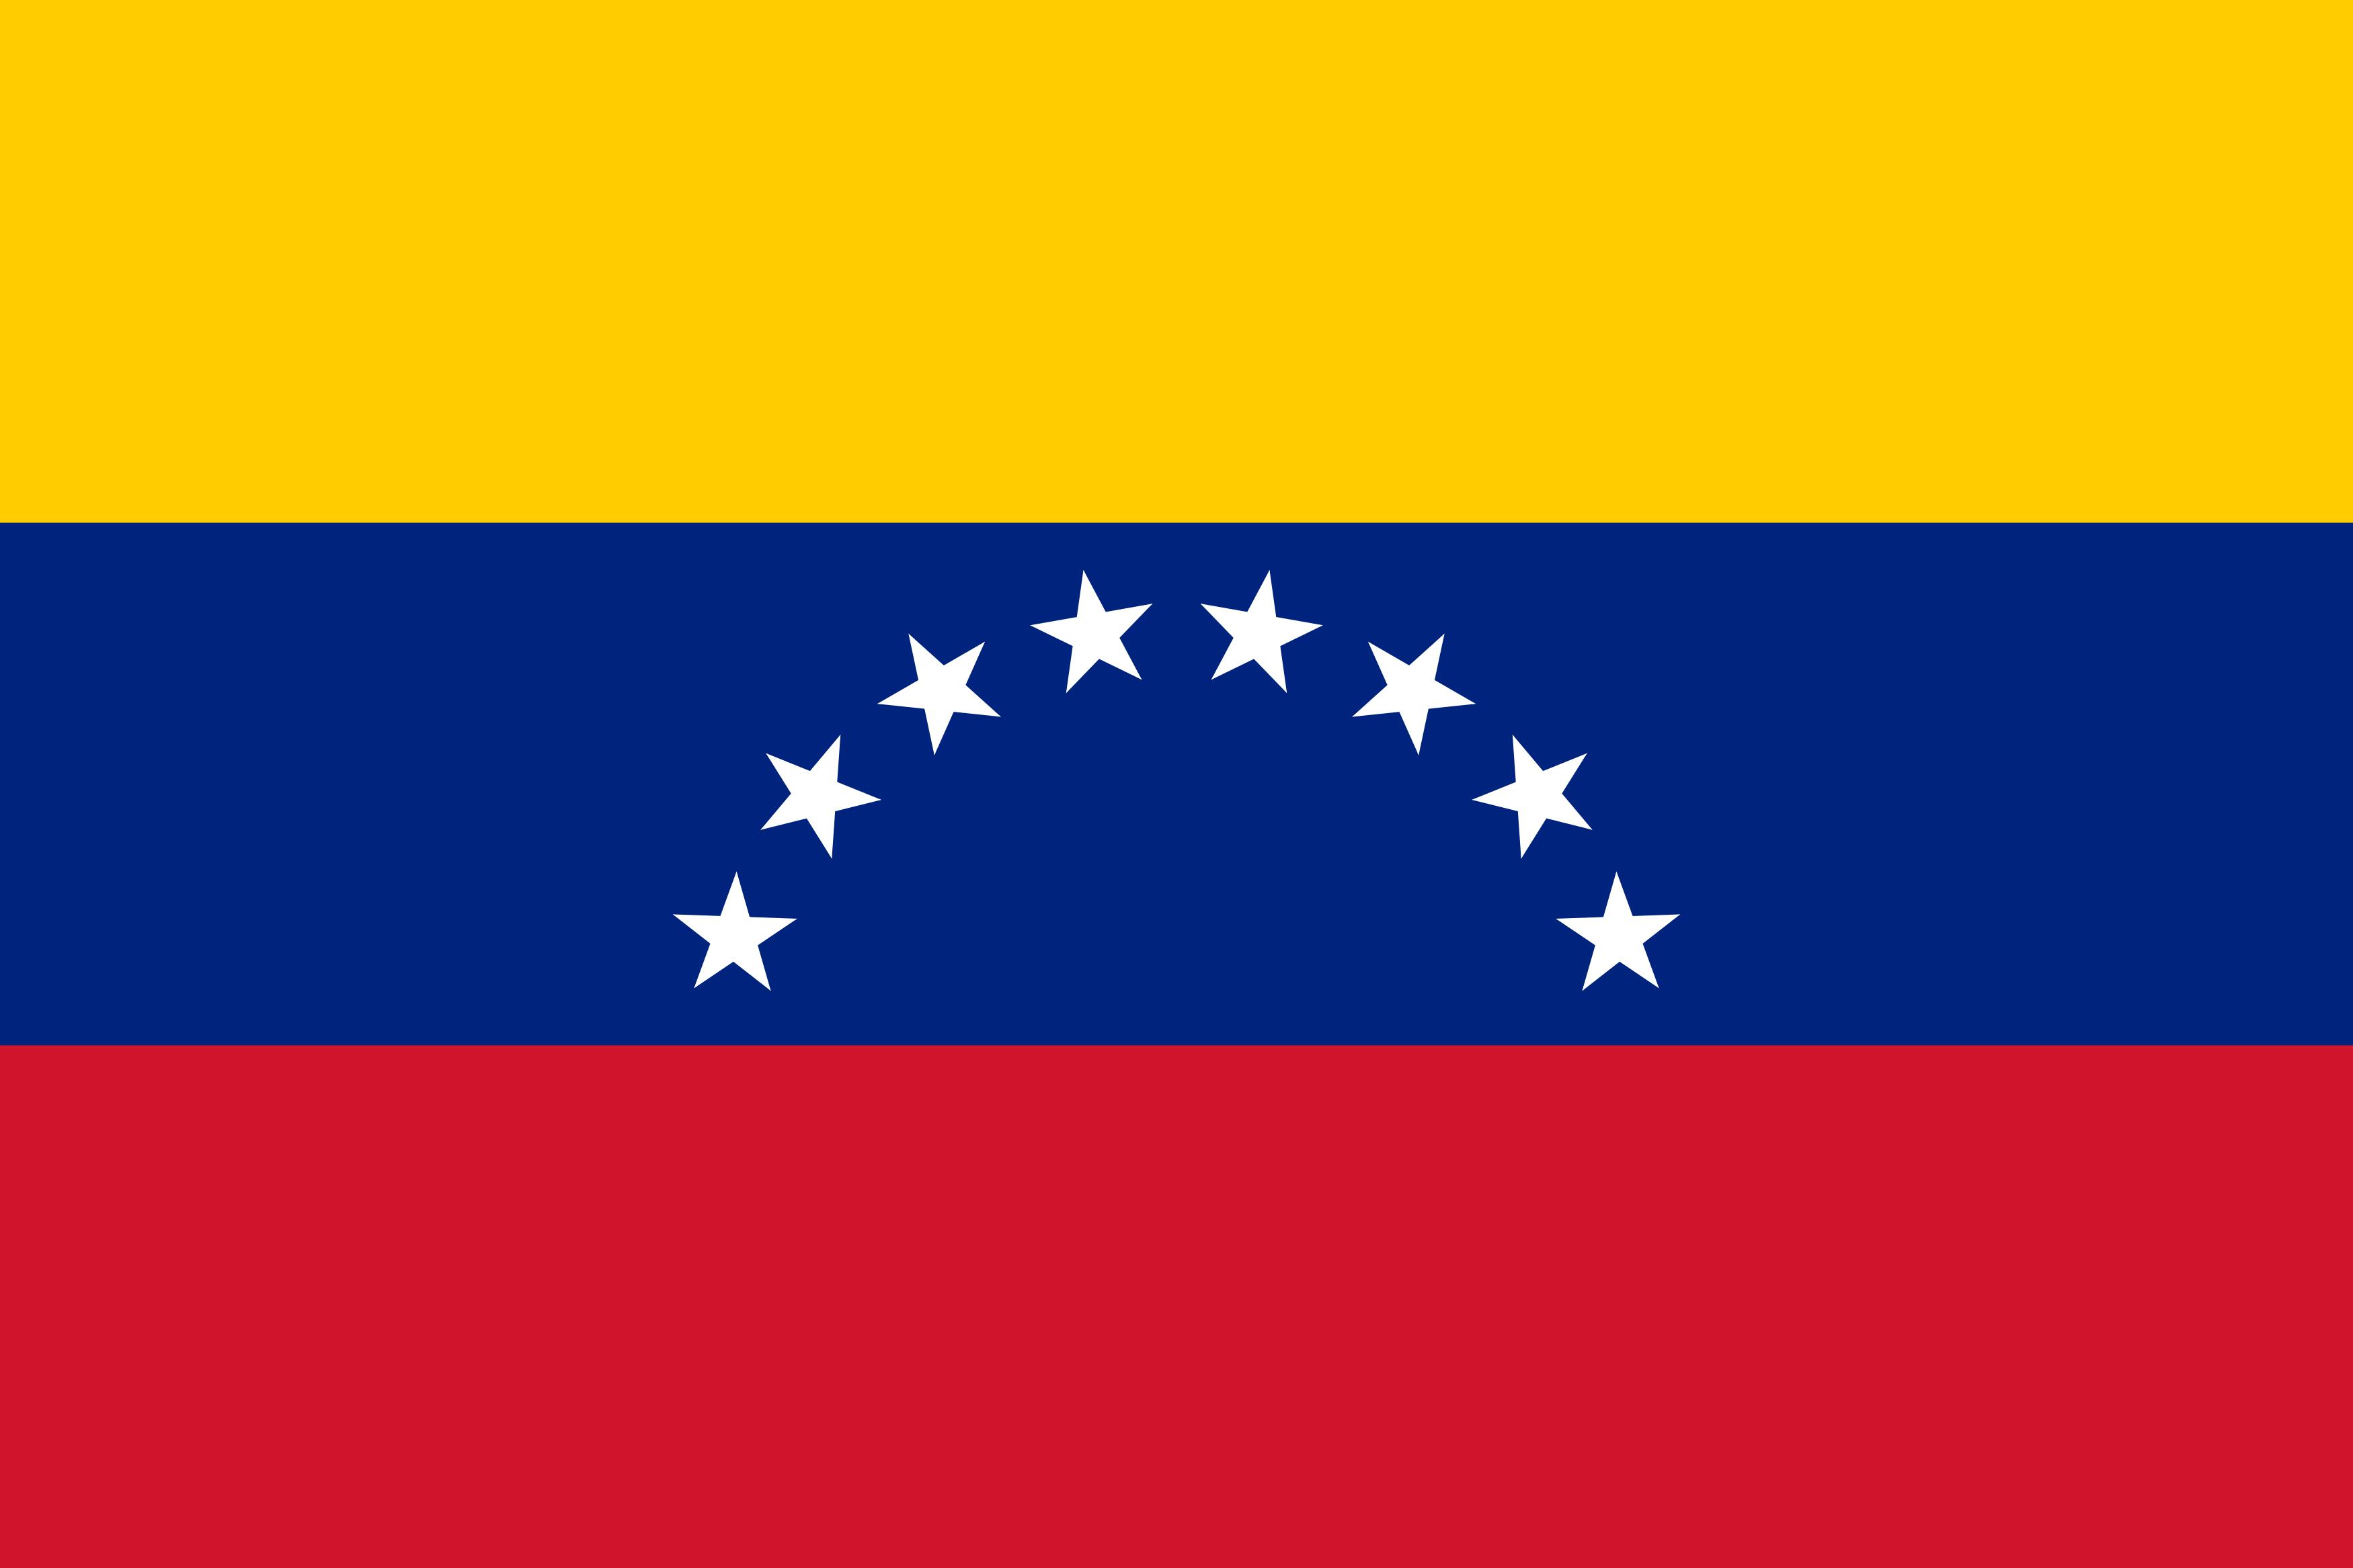 bandeira da venezuela - Bandeira da Venezuela